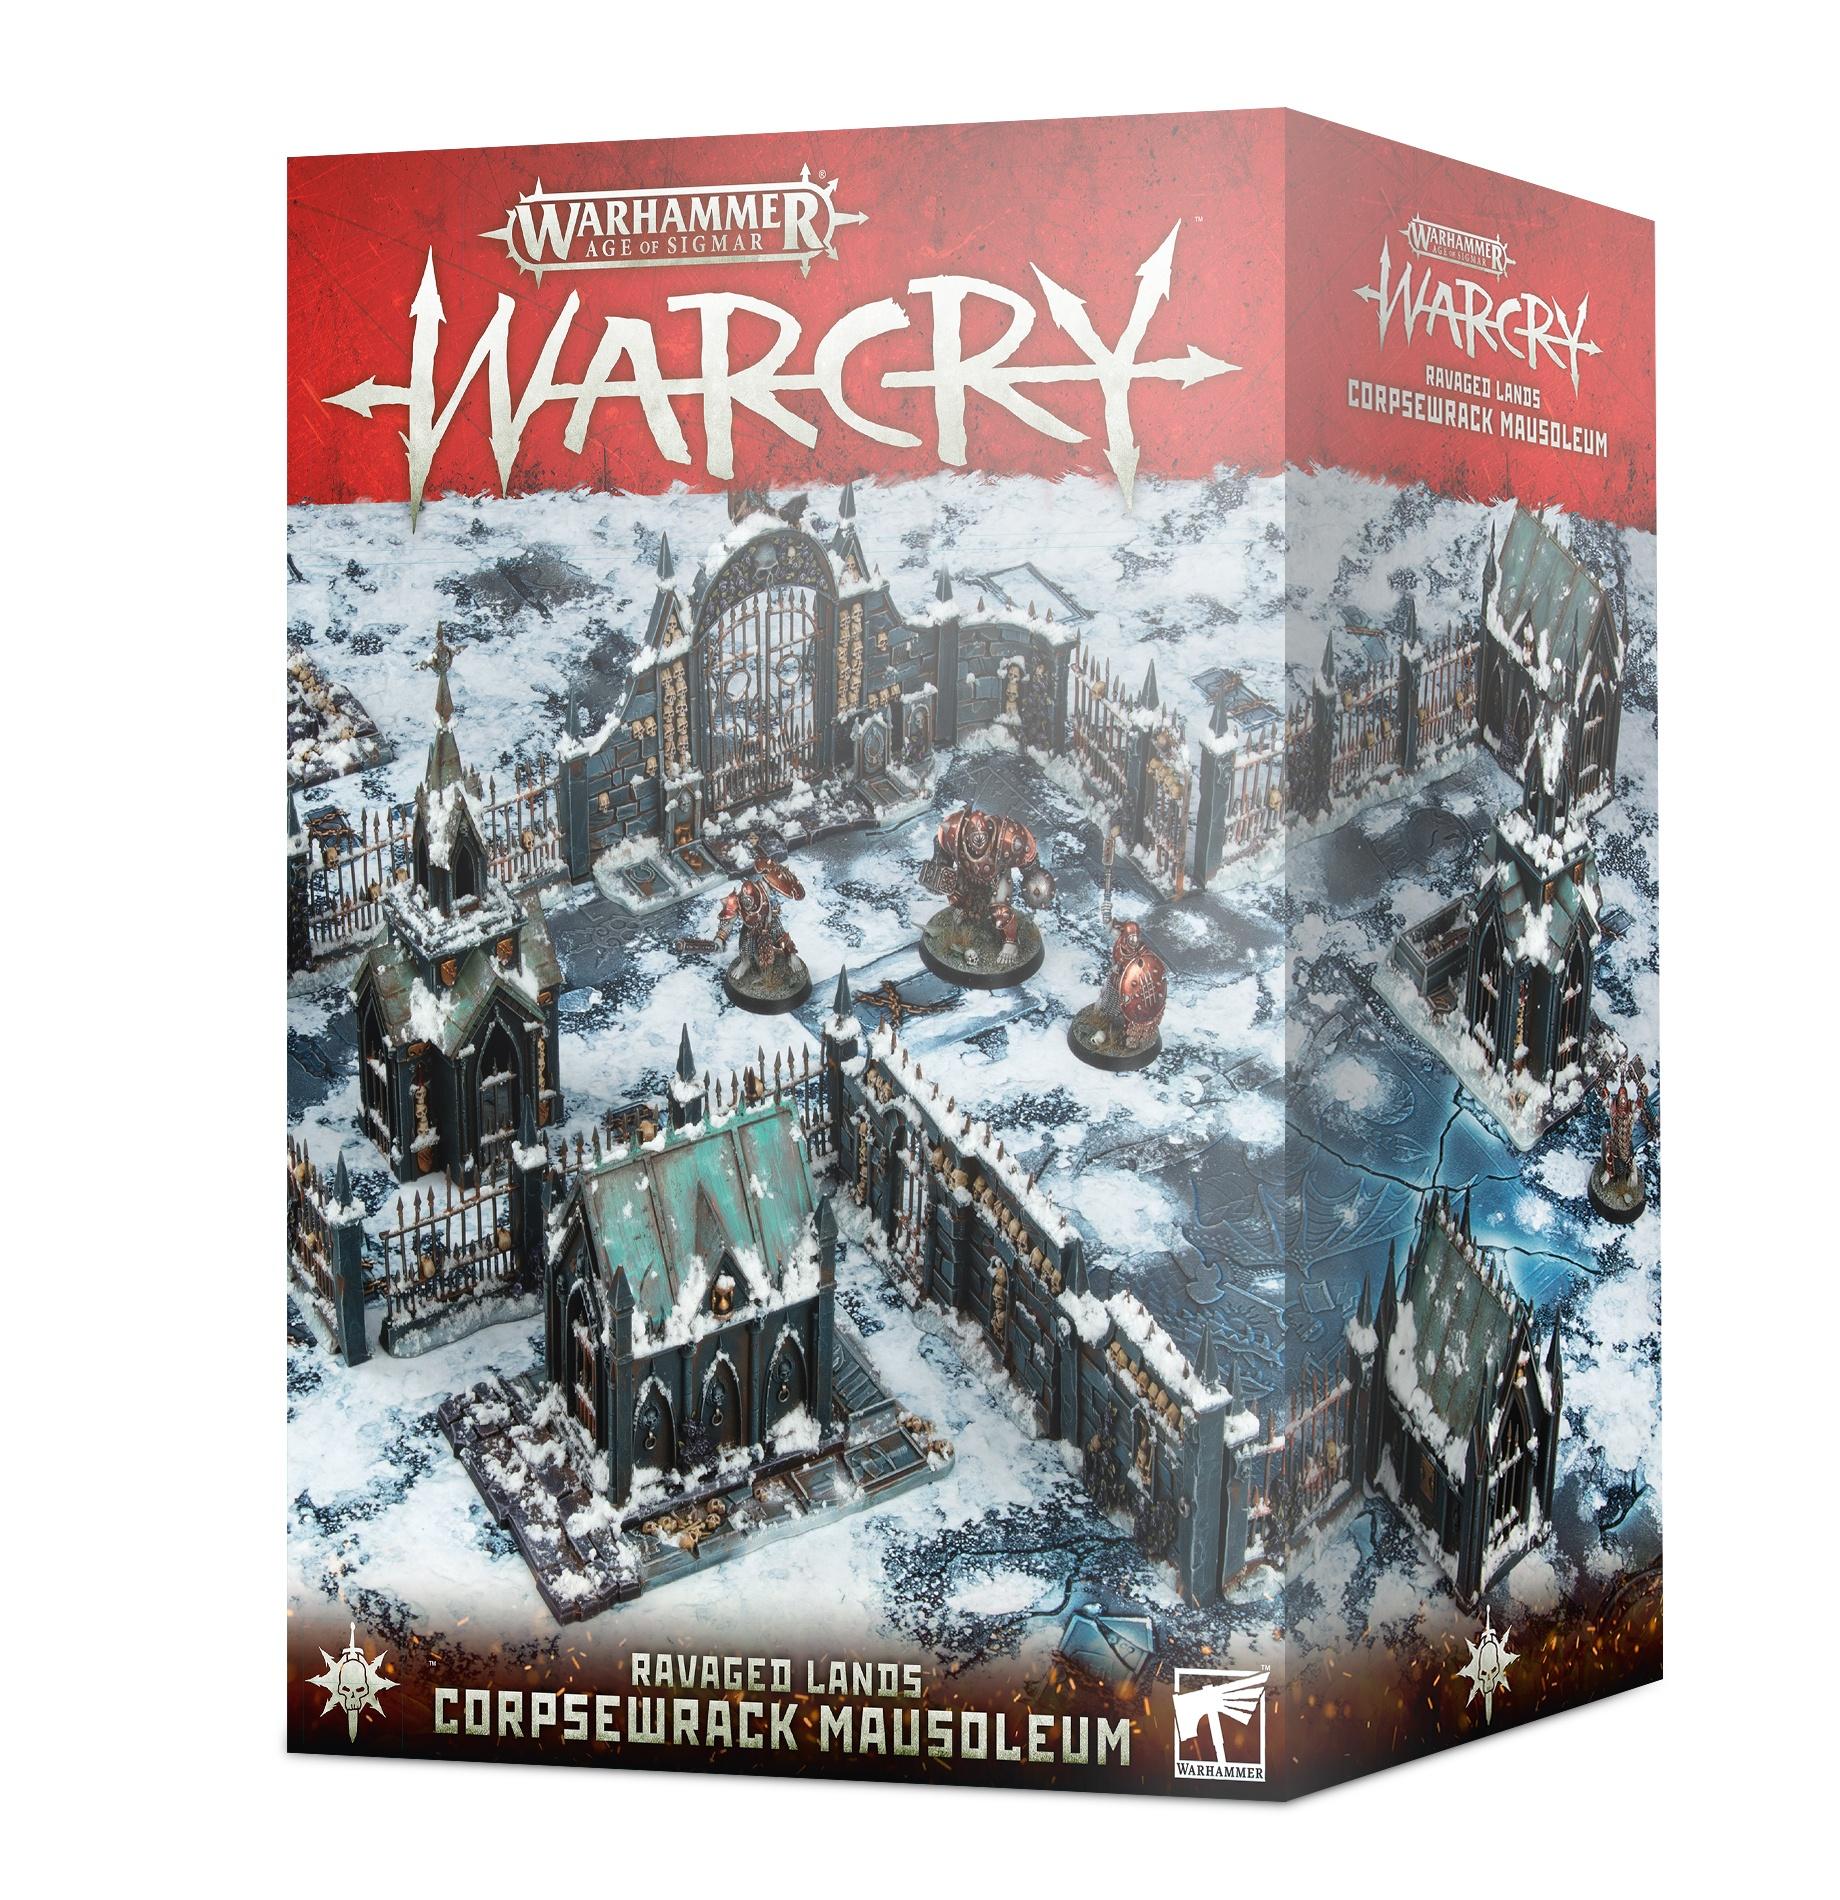 Corpsewrack Mausoleum, Warcry